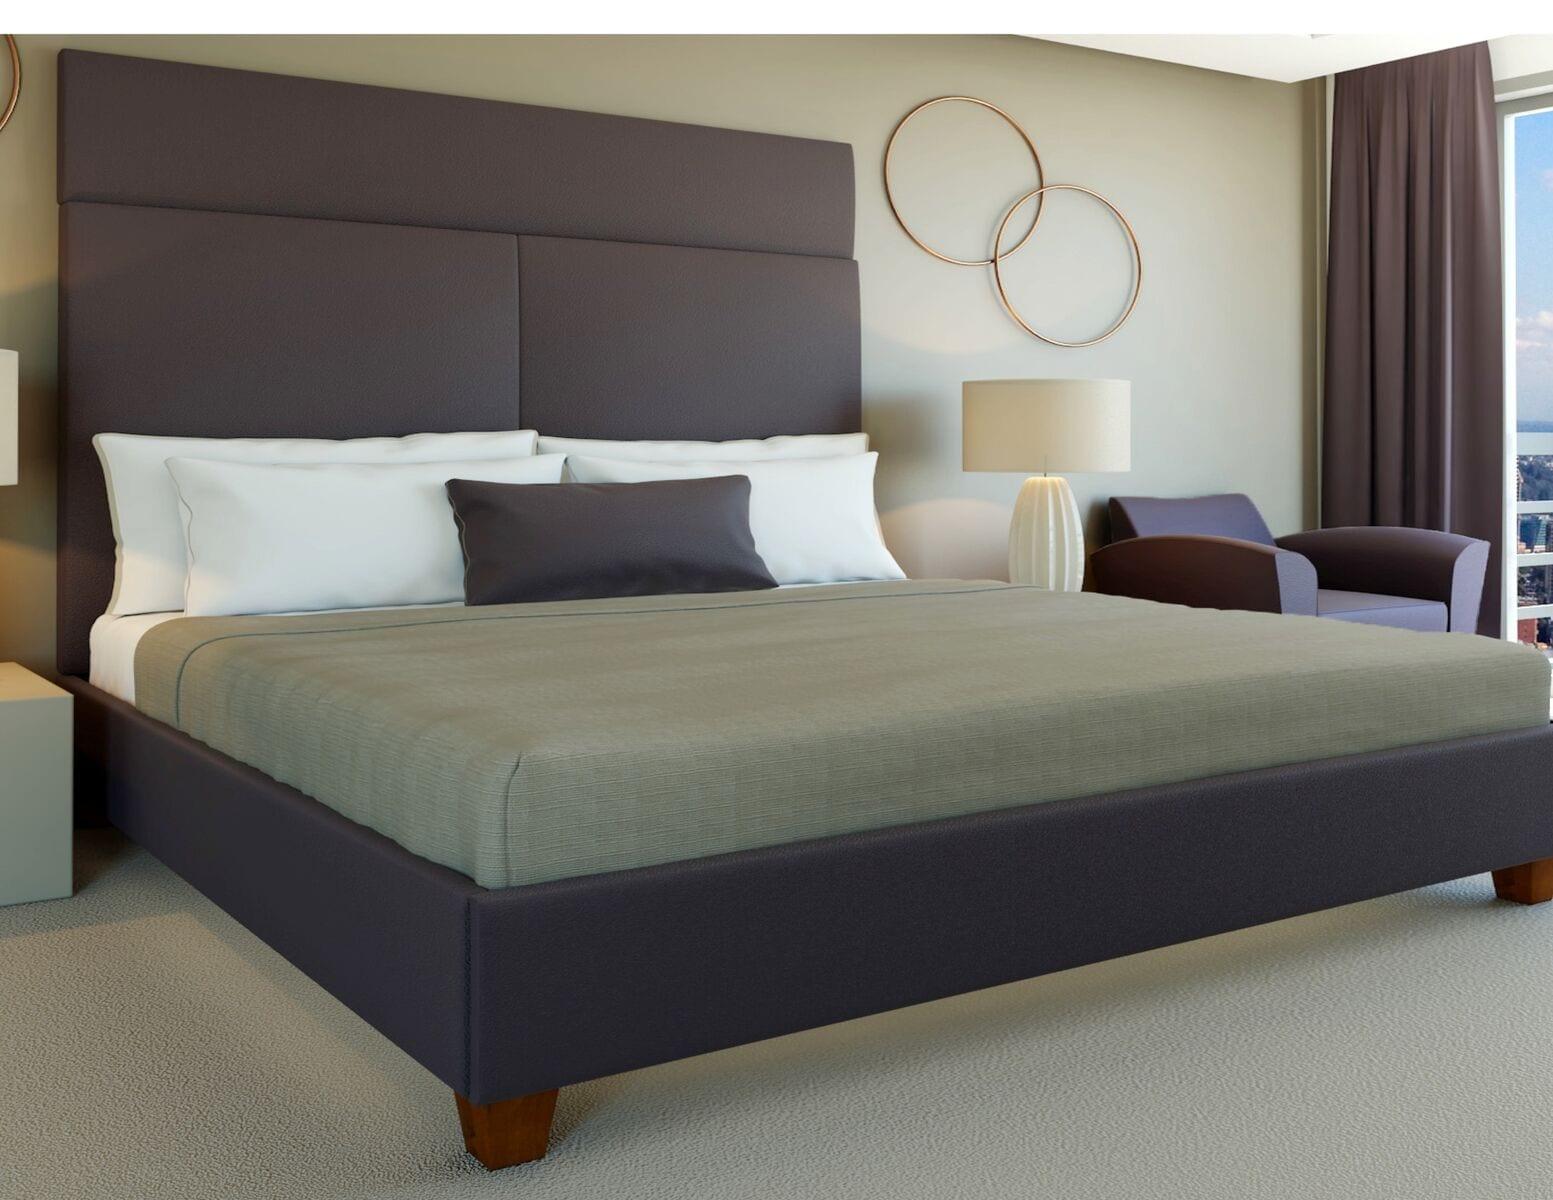 Casper - Wall mounted upholstered, luxury headboard with custom upholstered wall panels - Custom luxury, upholstered beds with high end, bedroom textiles | Blend Home Furnishings